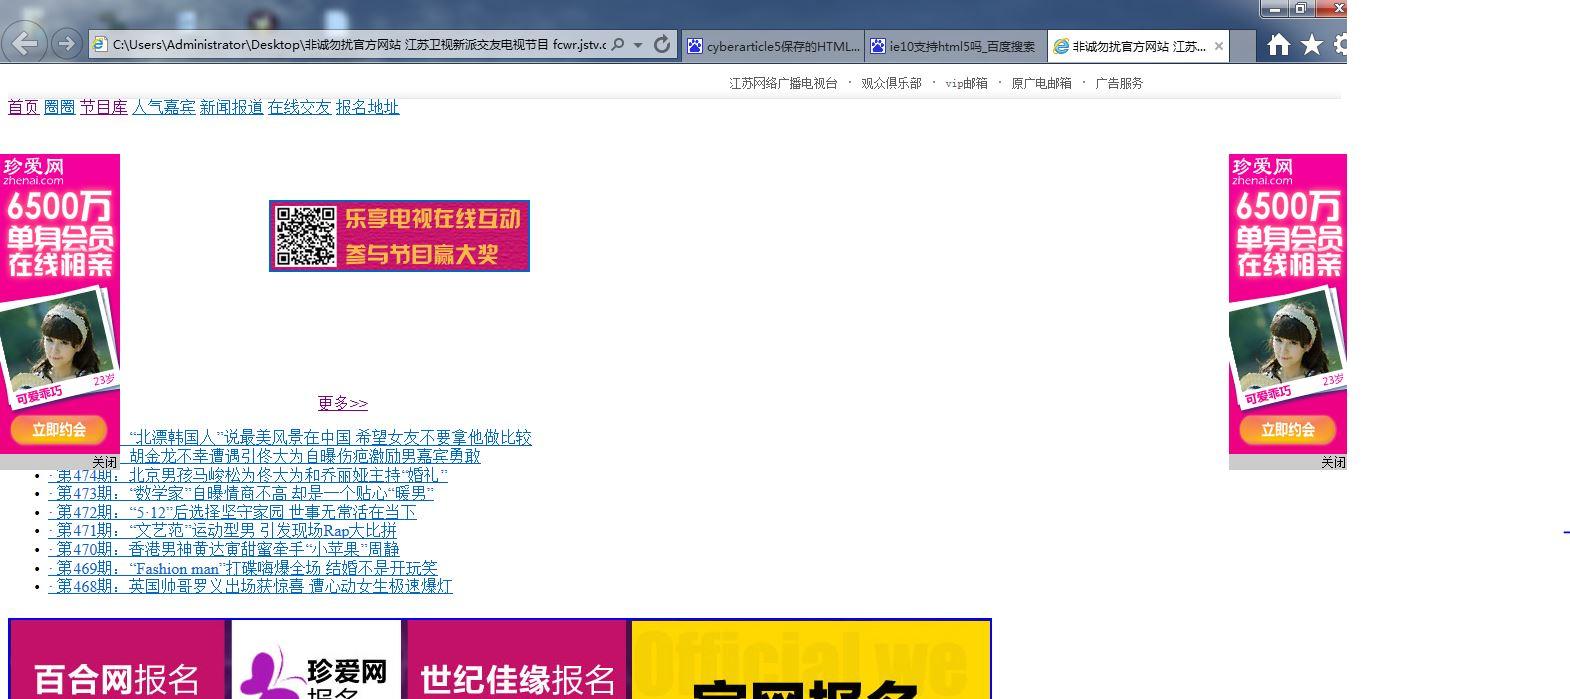 cyerarticle5保存当前网页ie10打开显示不全